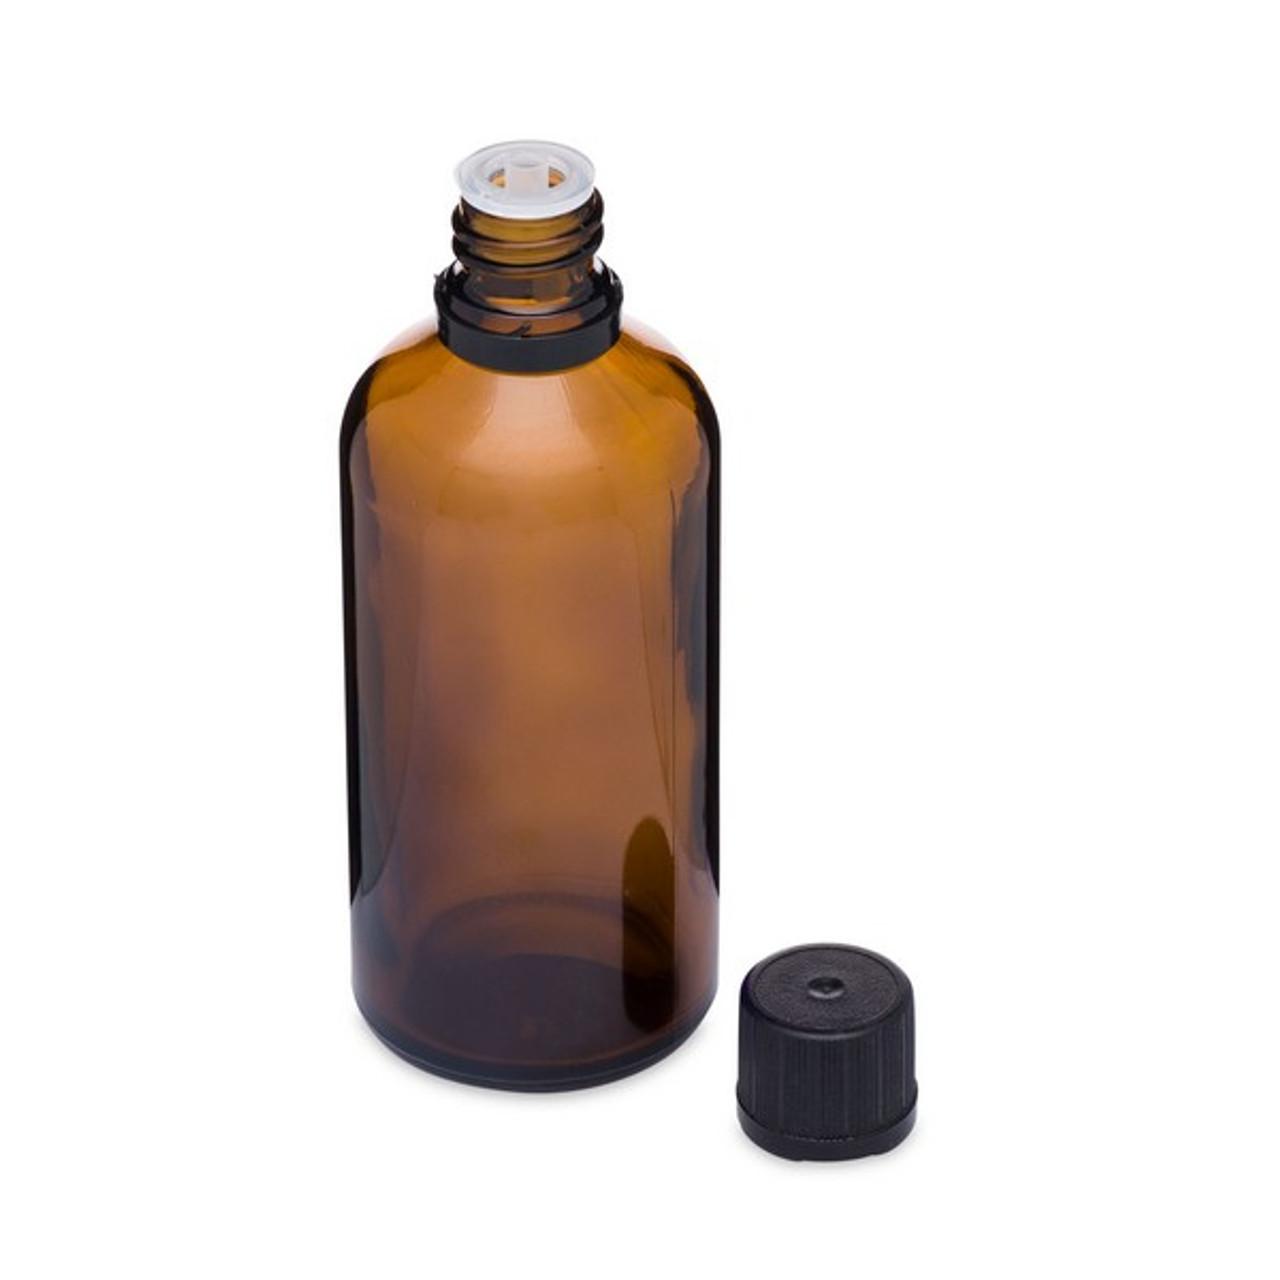 8c670090cfce 3.4 oz Amber Glass Euro Dropper Bottles (Black Tamper-Evident Cap) -  8624B11ABR